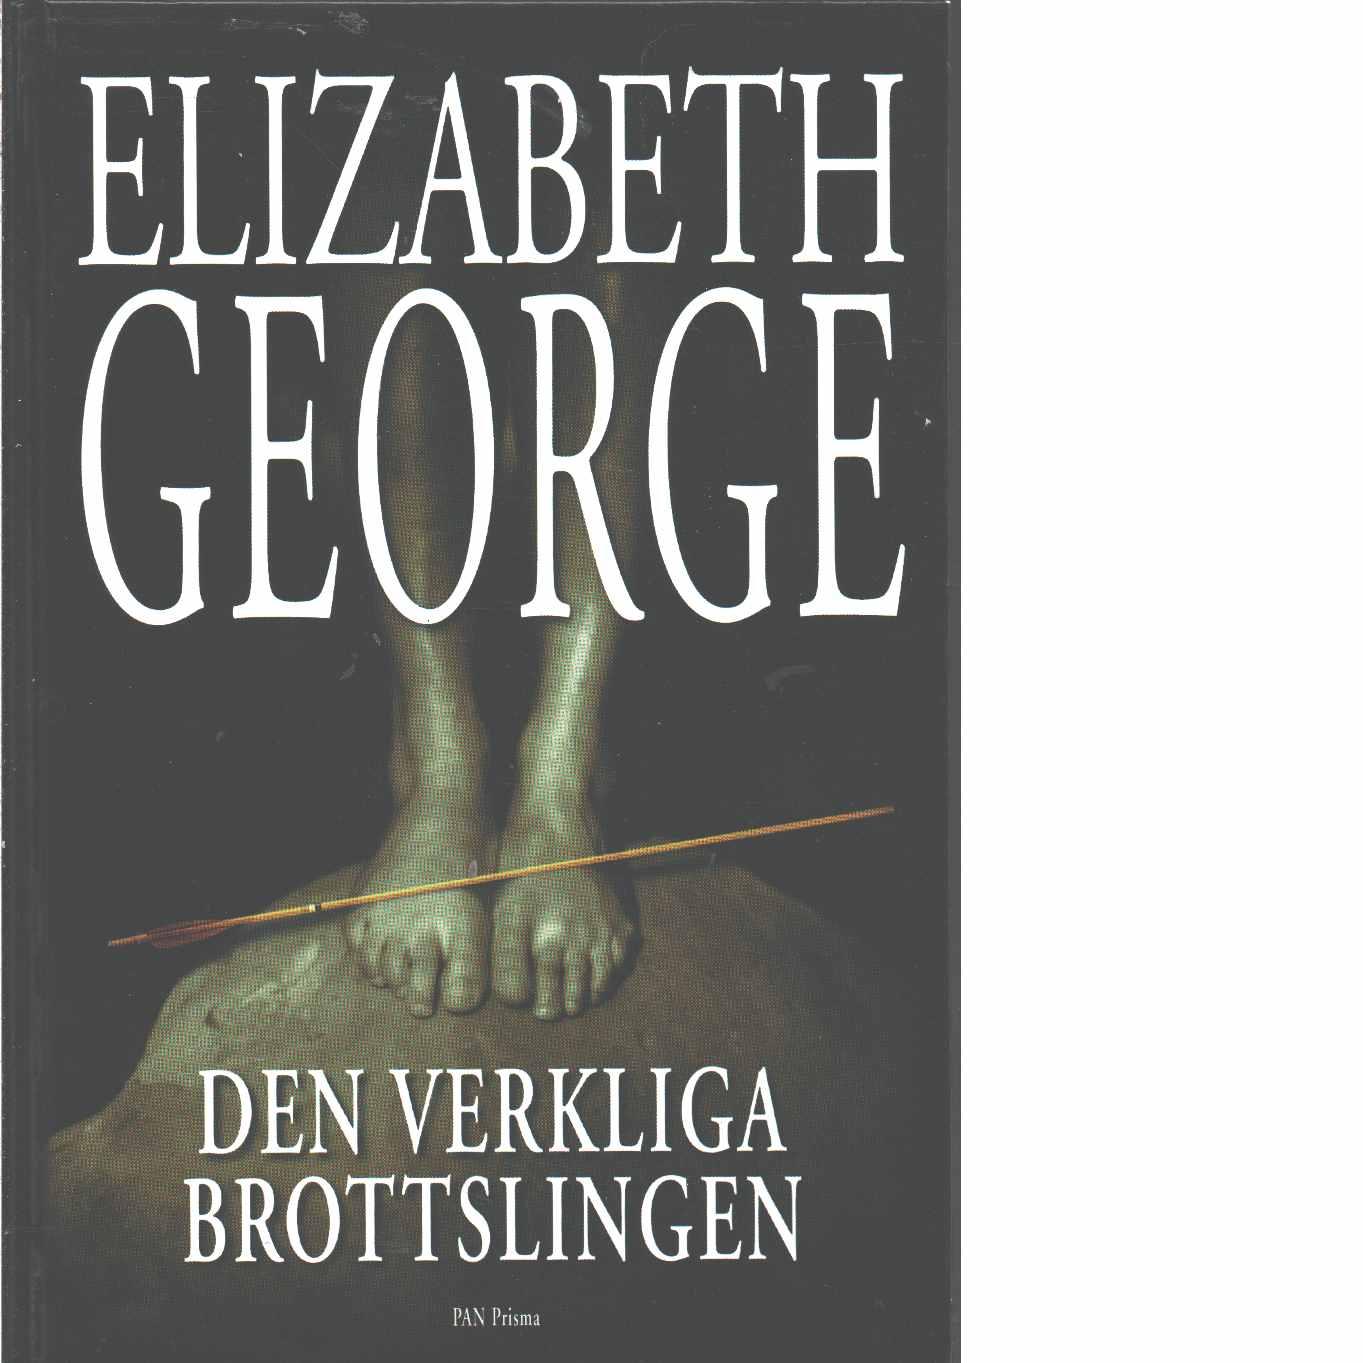 Den verkliga brottslingen - George, Elizabeth